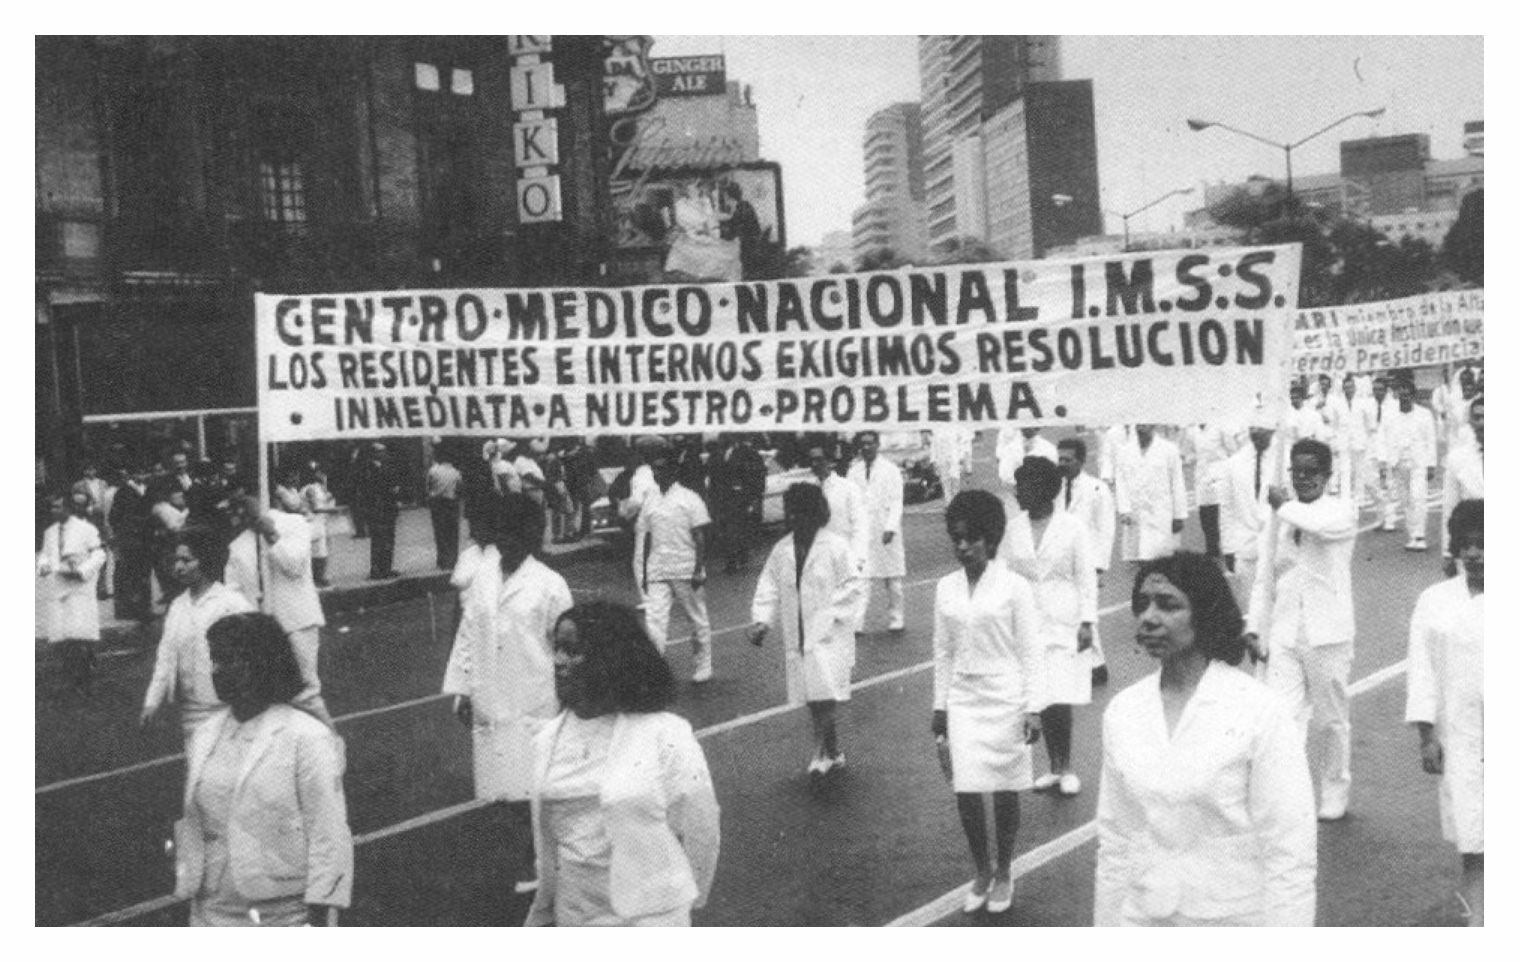 Marcha IMSS México, 1960